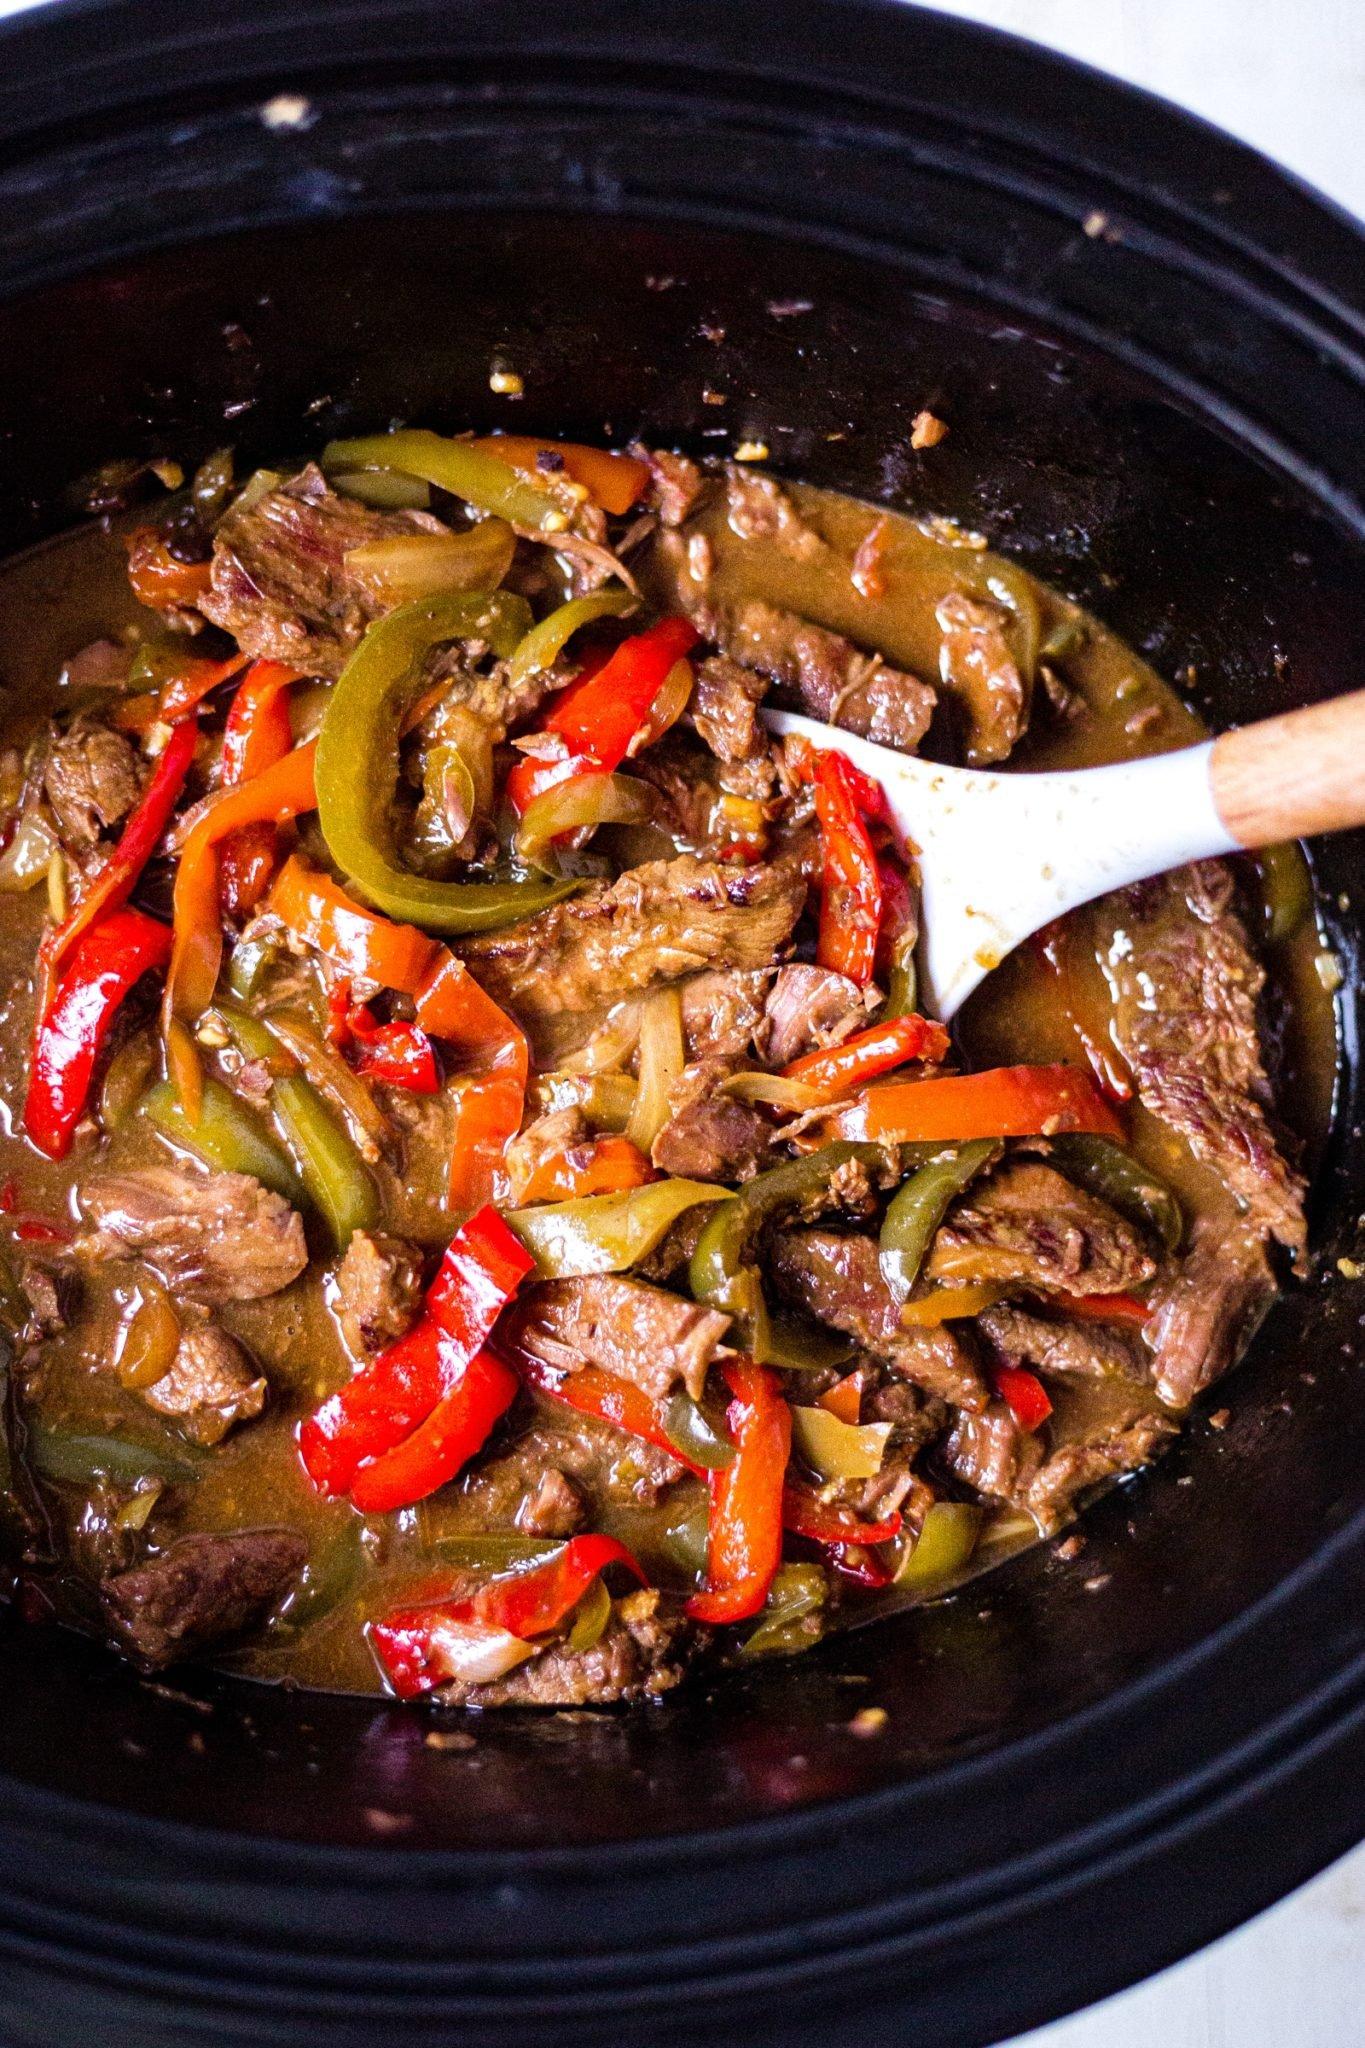 pepper steak recipe in the crockpot with a serving spoon